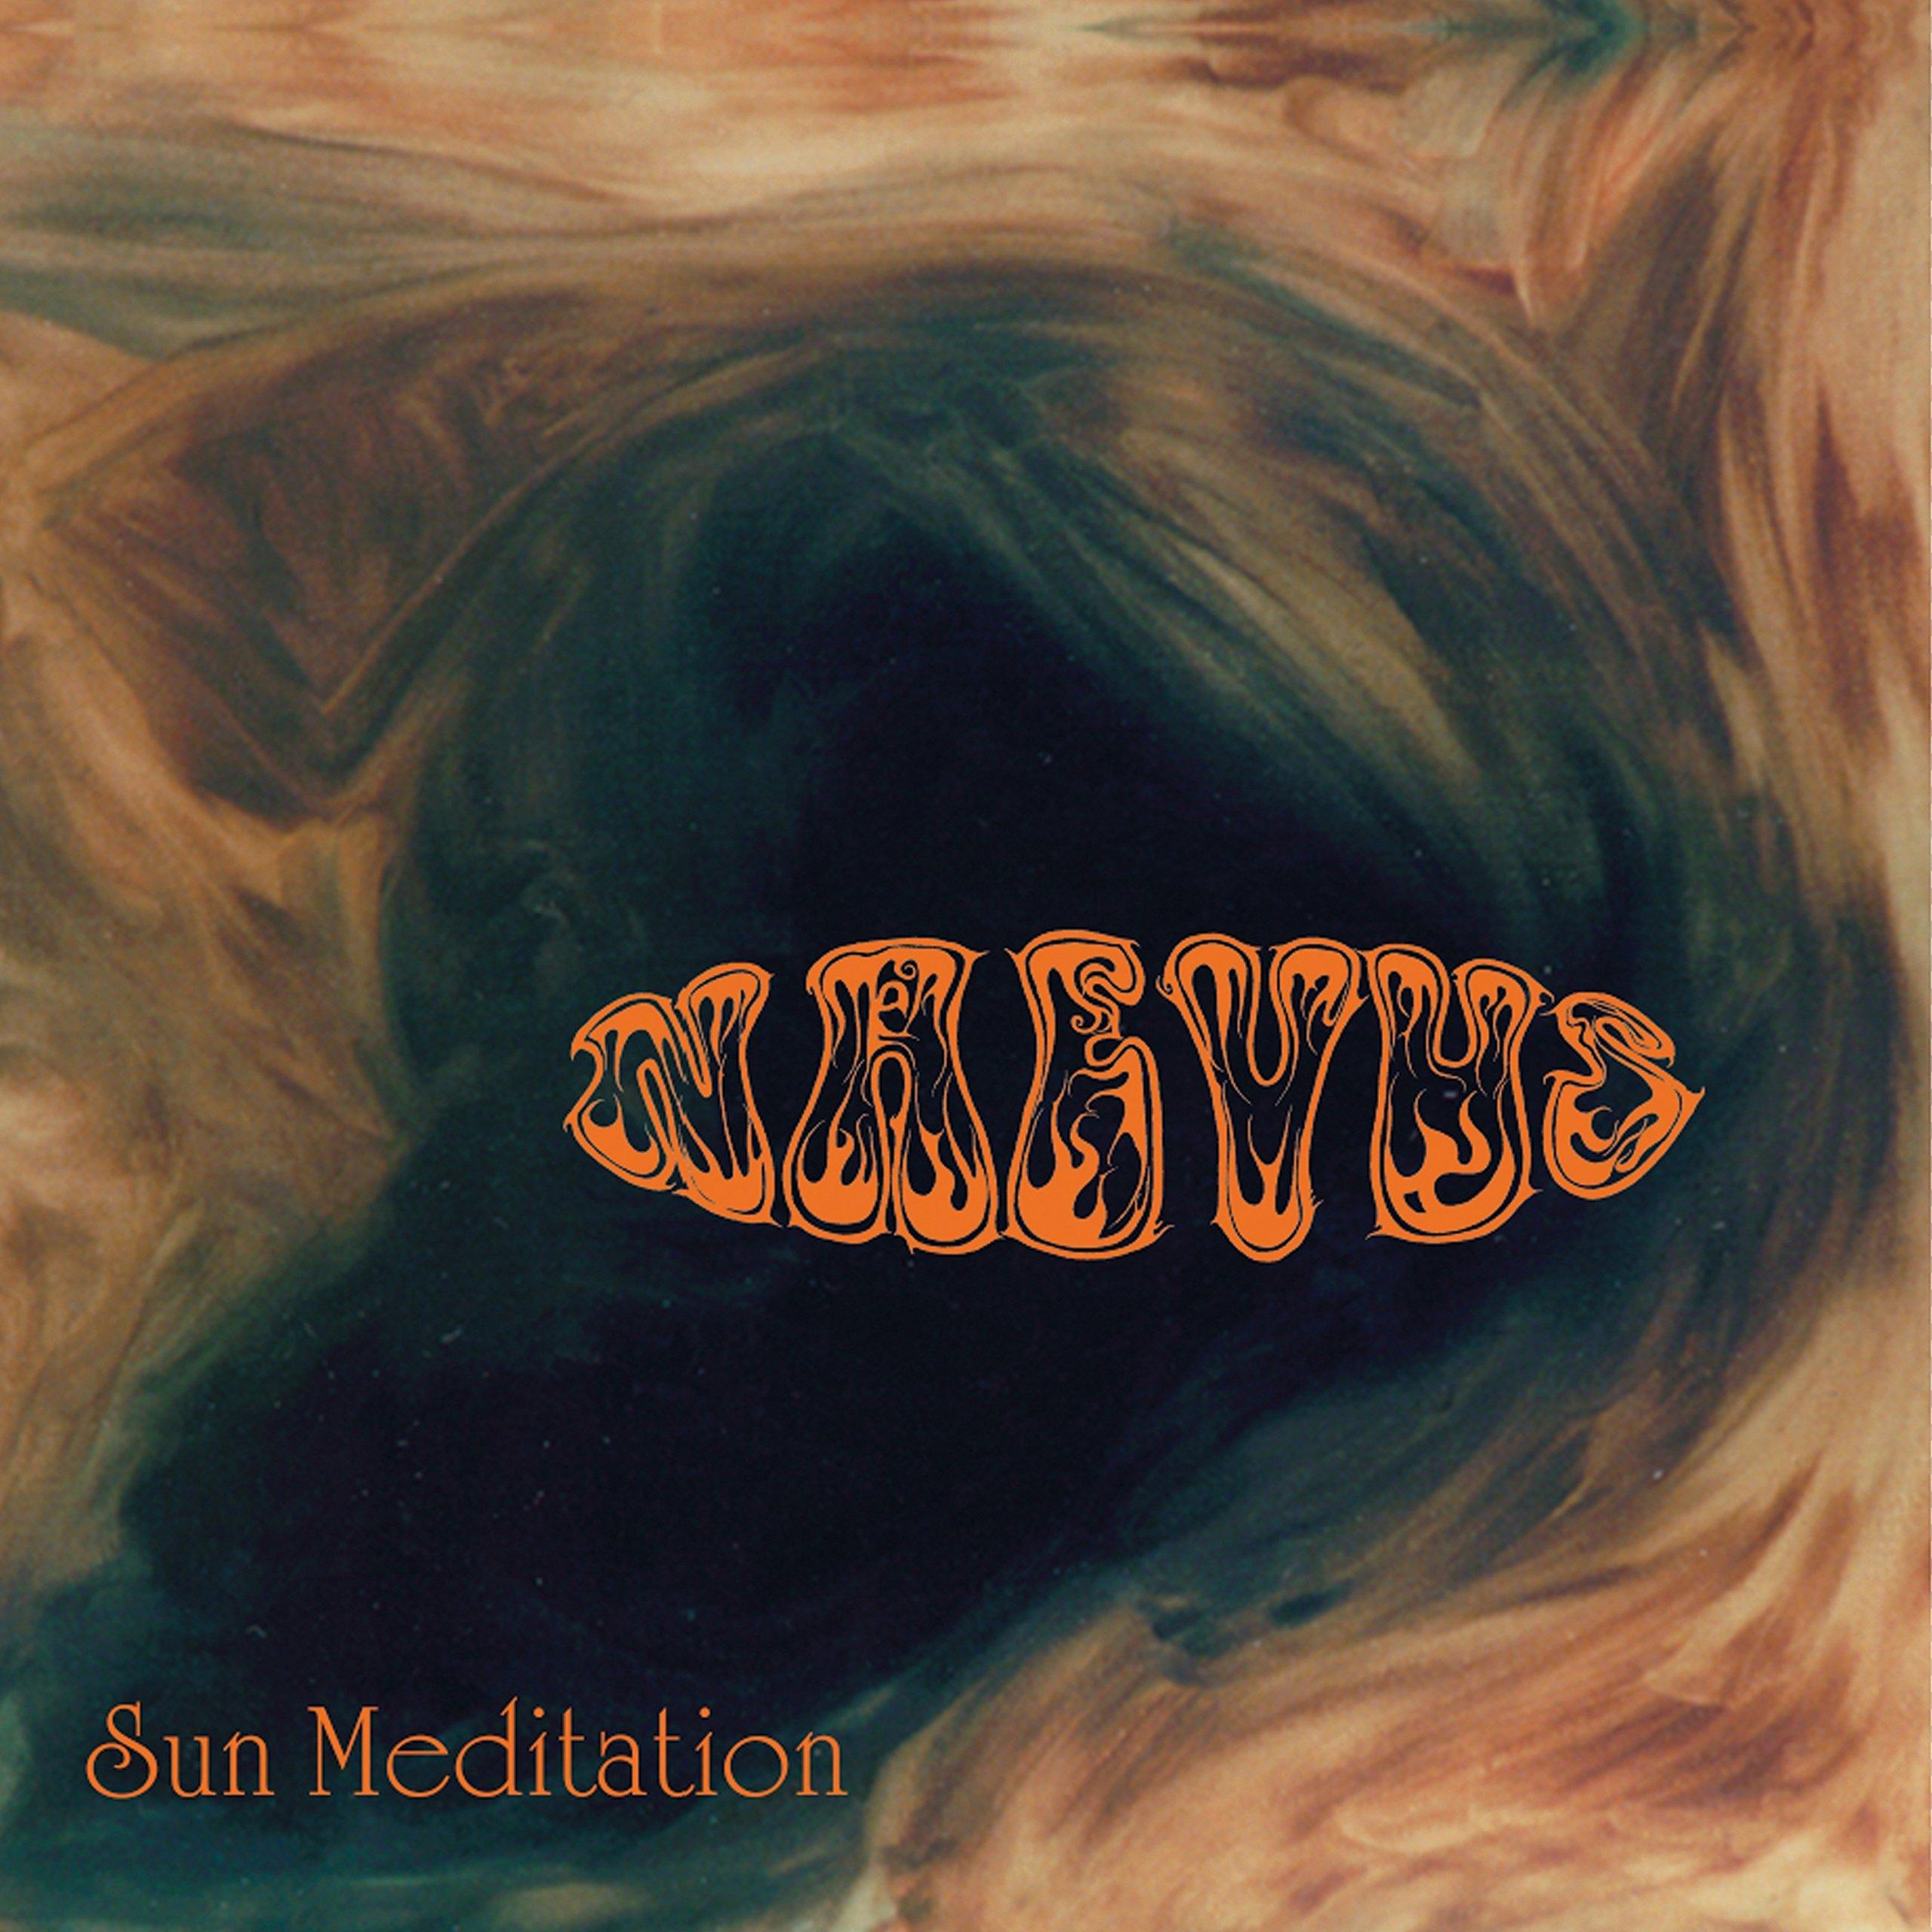 Naevus - Sun Meditation (180 Gram Vinyl, Purple, Gatefold LP Jacket, Download Insert)